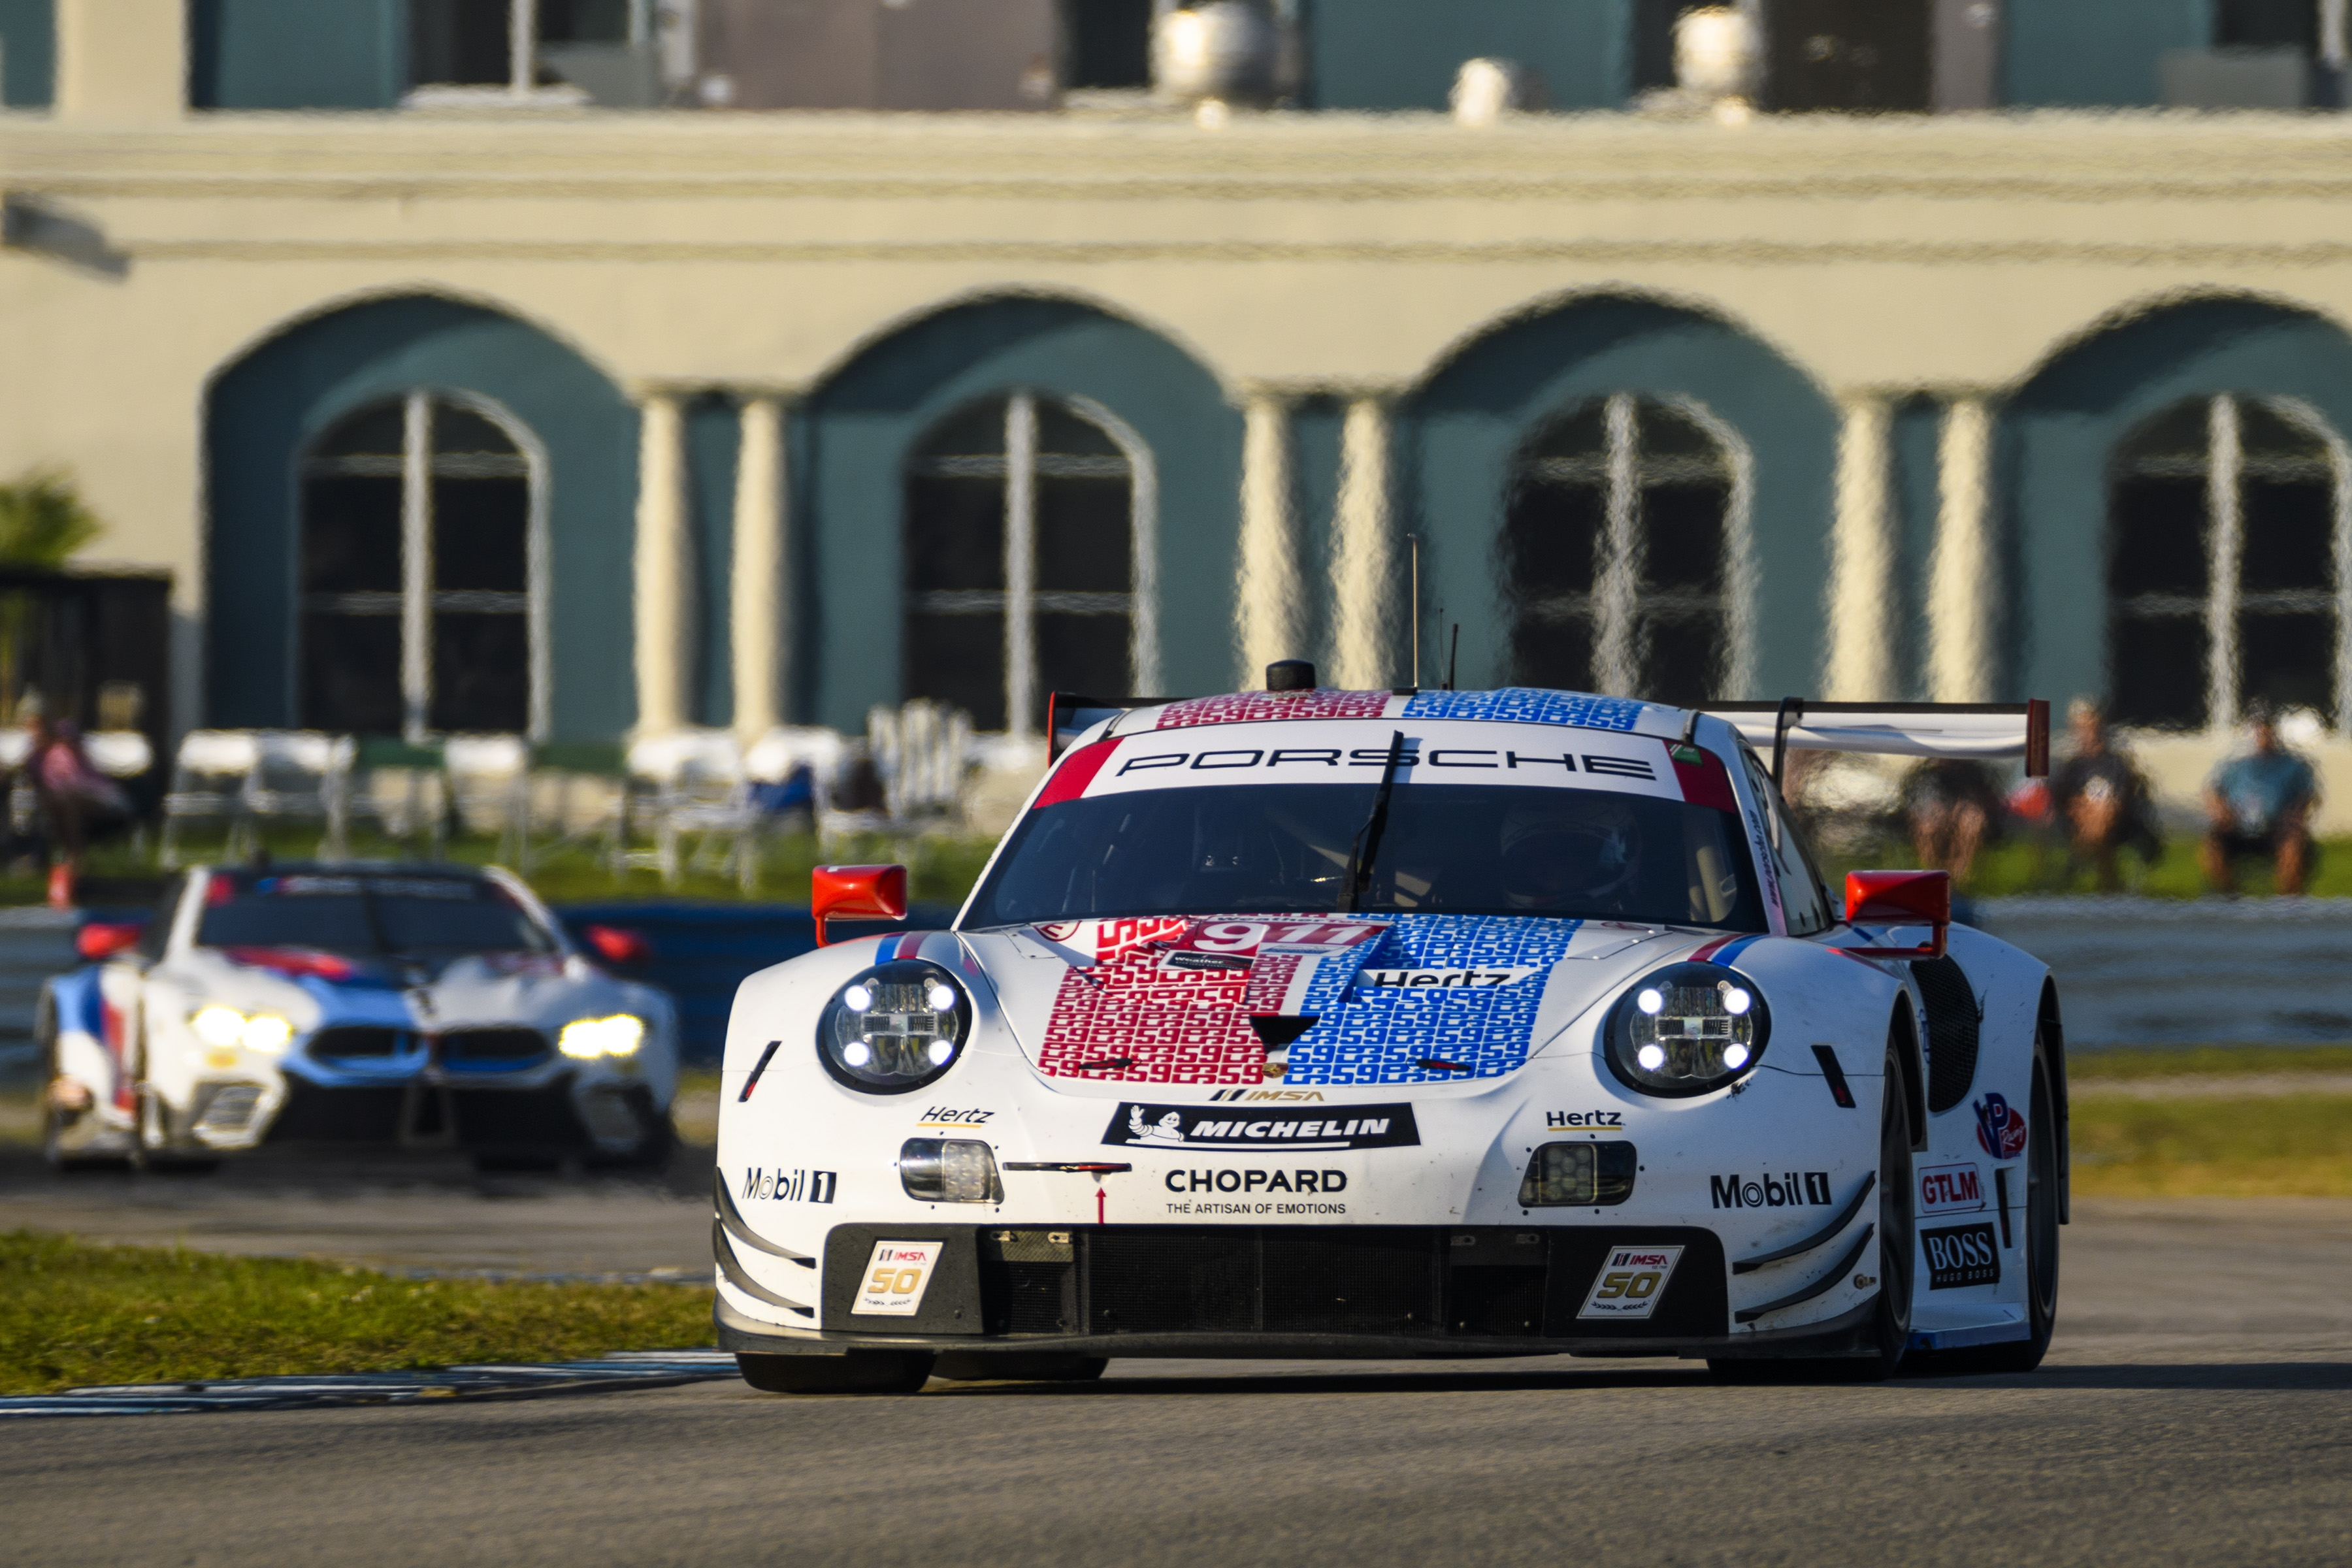 General 3600x2400 Porsche Porsche 911 RSR car white cars vehicle BMW M8 GTE Porsche 911 Porsche 991 race tracks